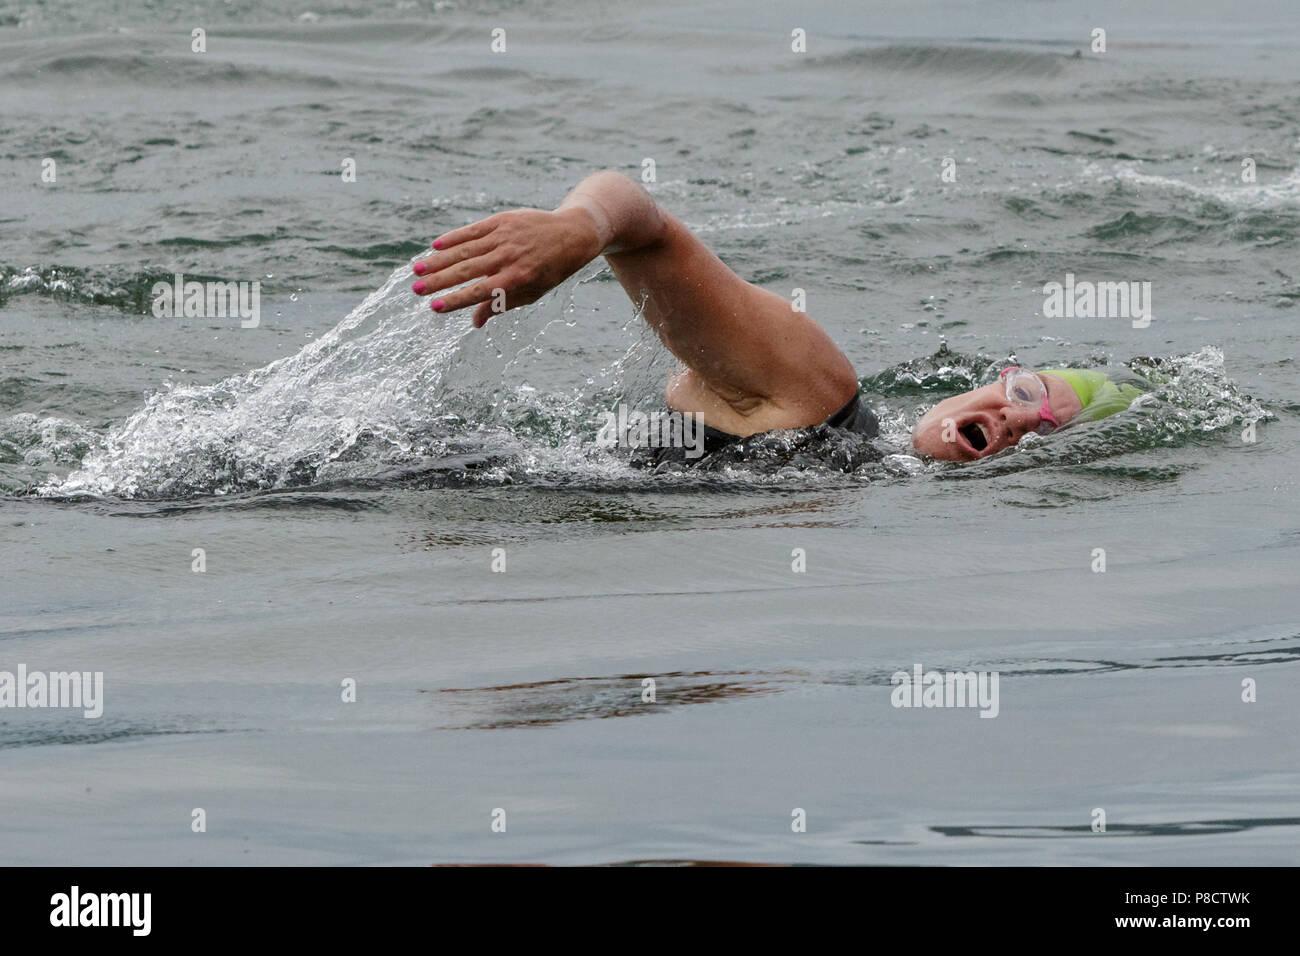 Olympic Triathlon Stock Photos & Olympic Triathlon Stock